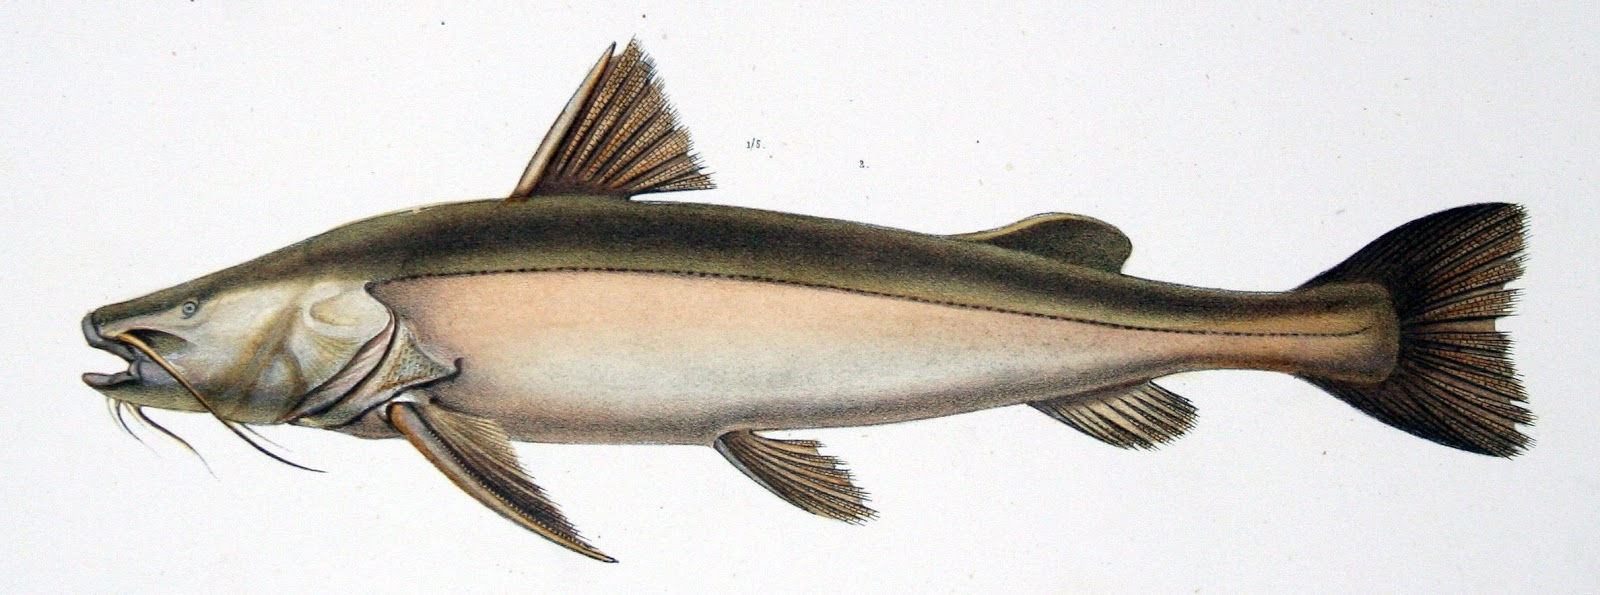 Peixe Jaú (Paulicea luetkeni)